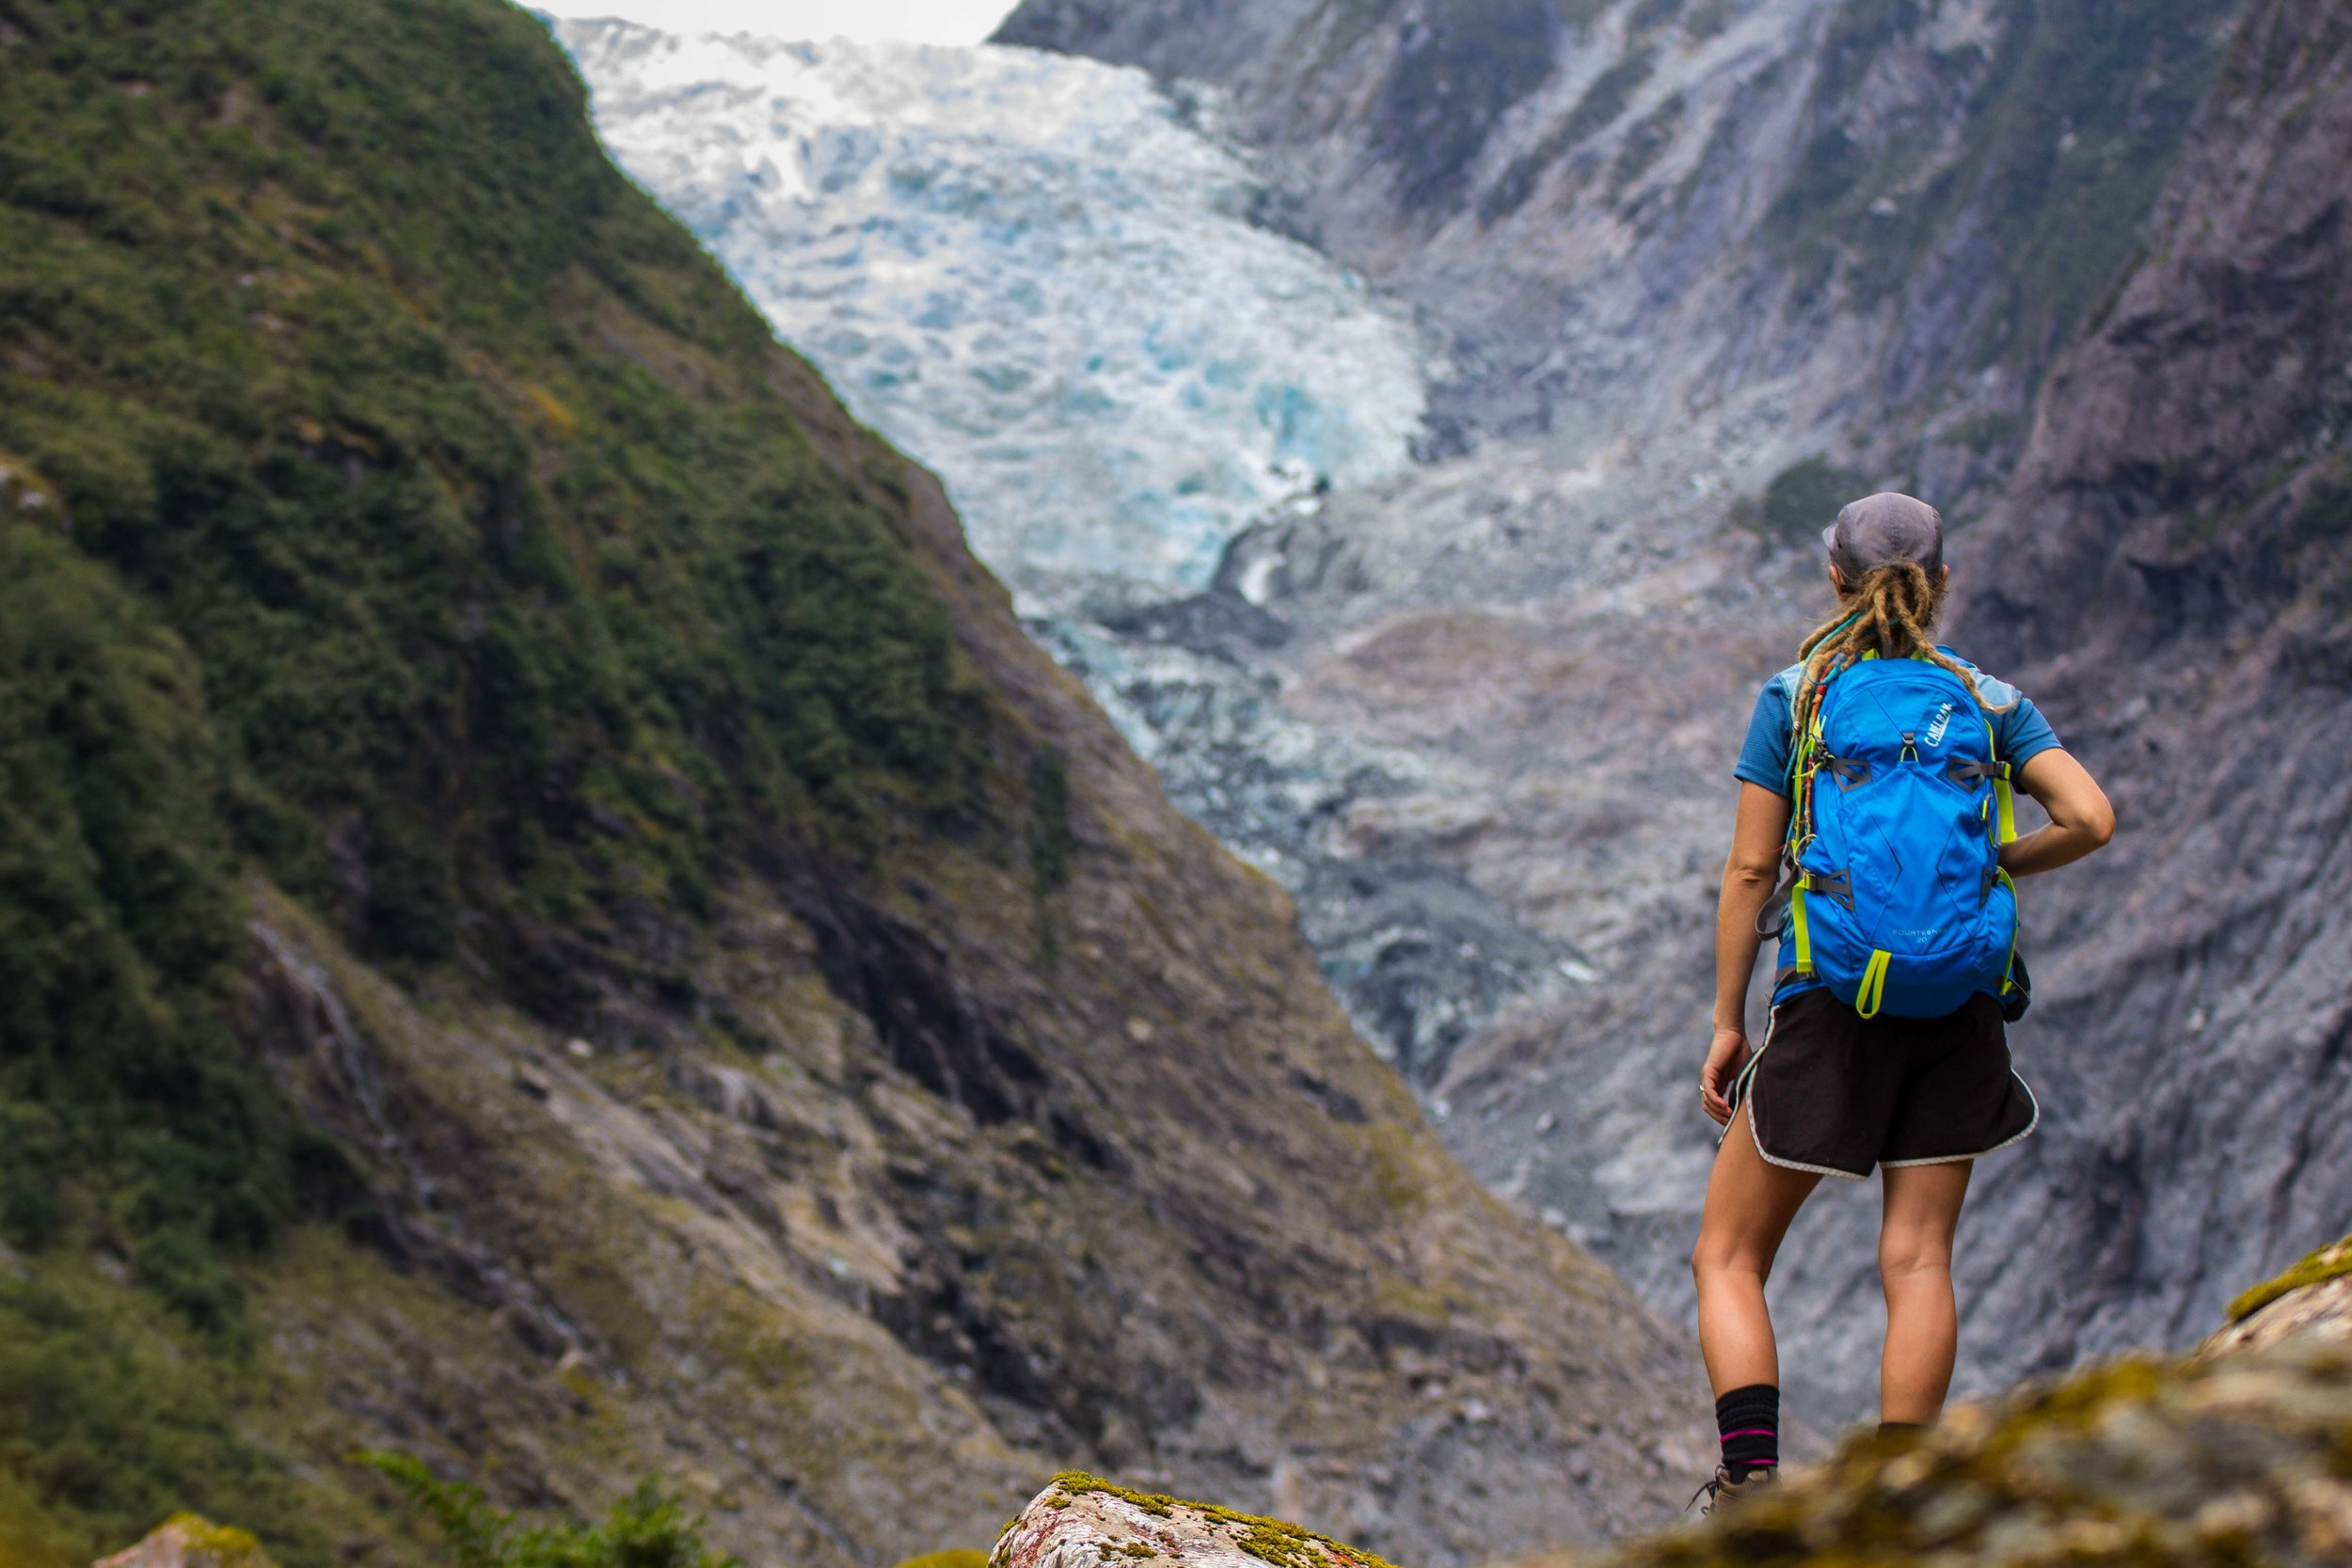 West Coast New Zealand Activities, Franz Joesph Glacier, Fox Glacier, Lake Matheson, reomote huts (3 of 4).jpg